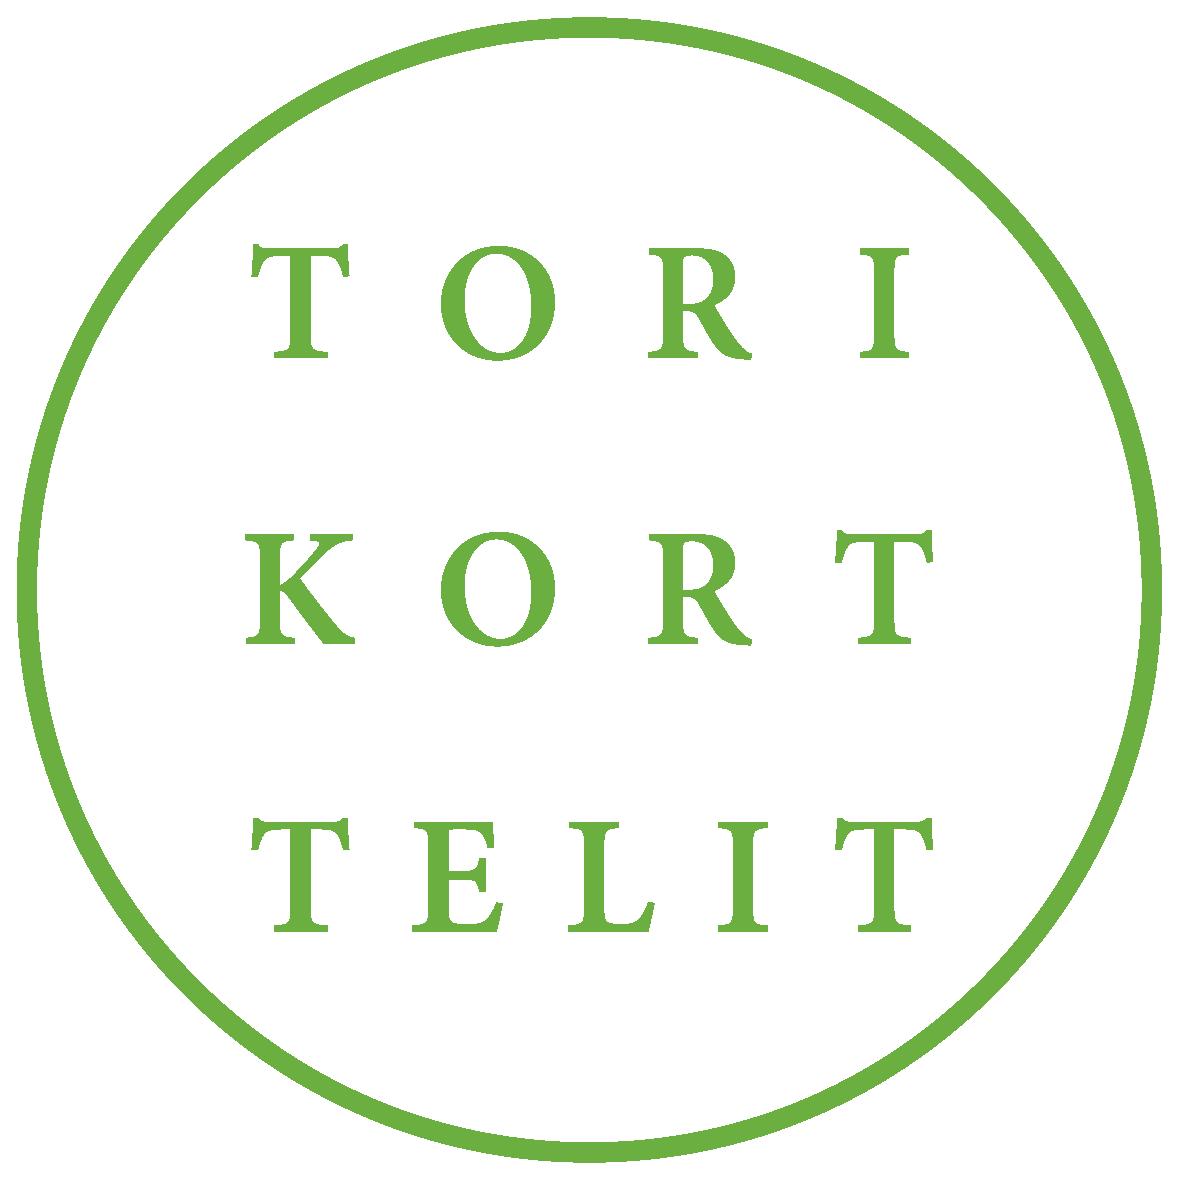 Helsingin Leijona Oy, Torikorttelit